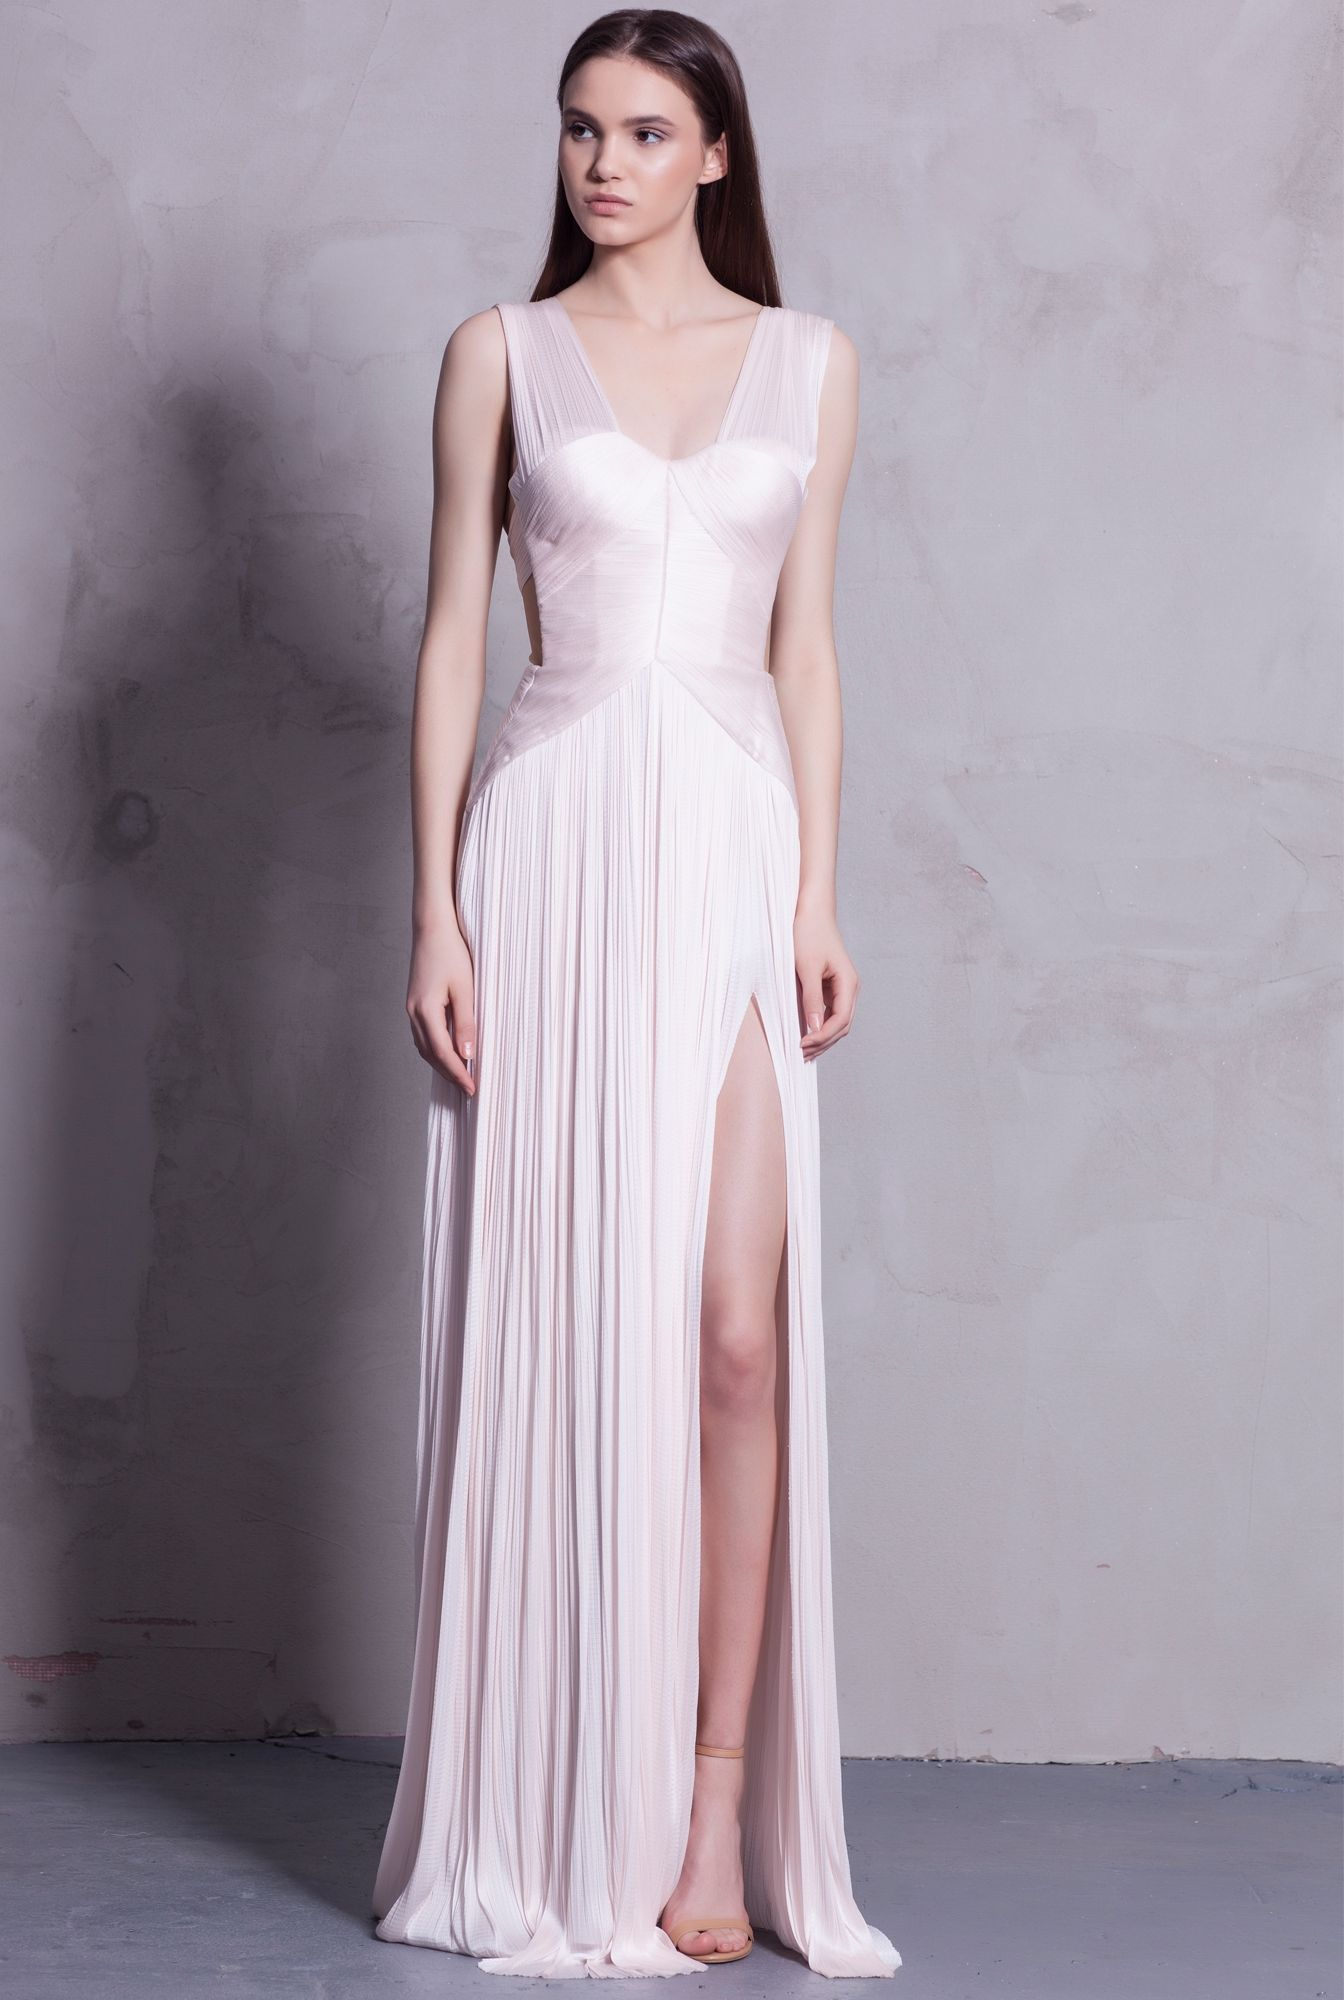 Click here to buy Maria Lucia Hohan OSTARA dress at MLH-SHOP.COM